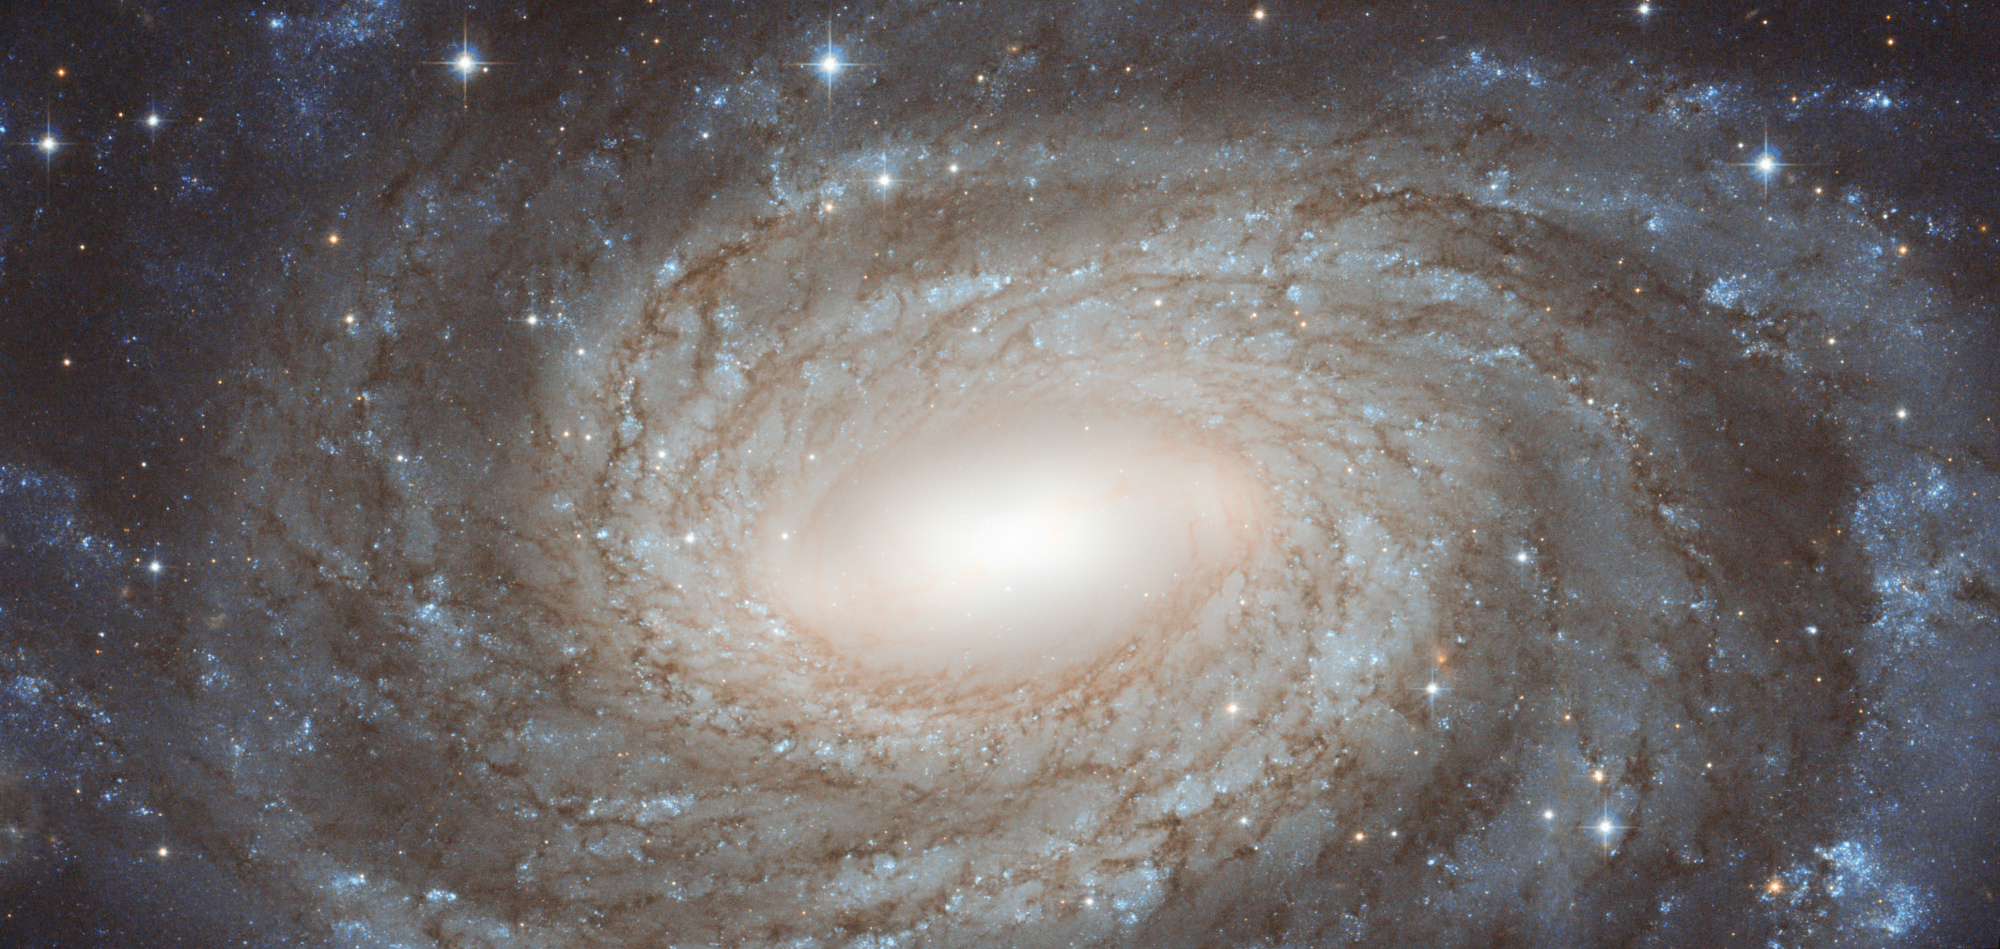 5c1cd5ffce753_HubbleNGC6384.thumb.jpg.abeca0517040b05abd49b9d6bdf31f91.jpg